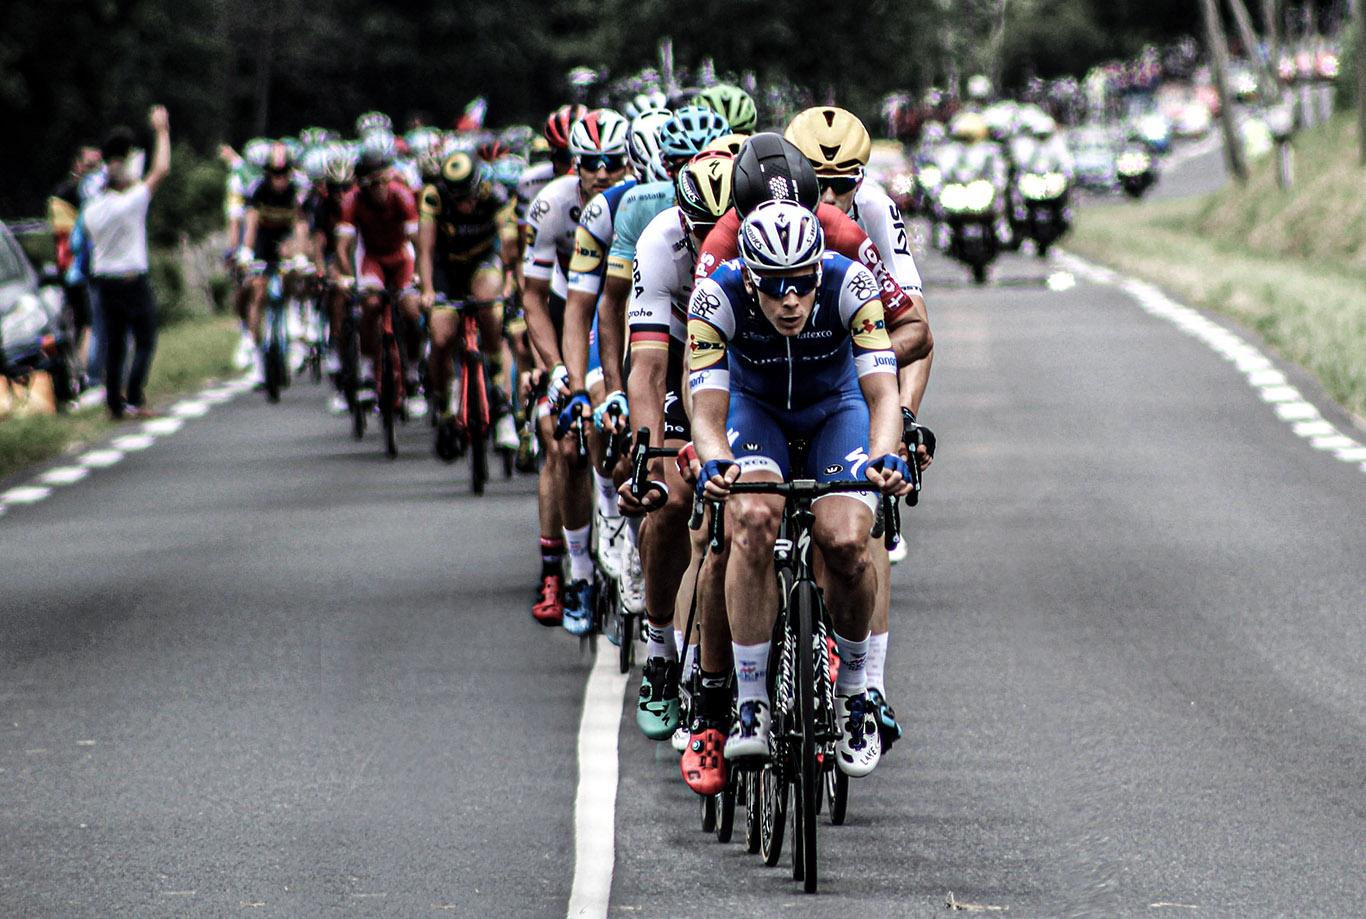 EXTRA: Giro d'Italia 2021